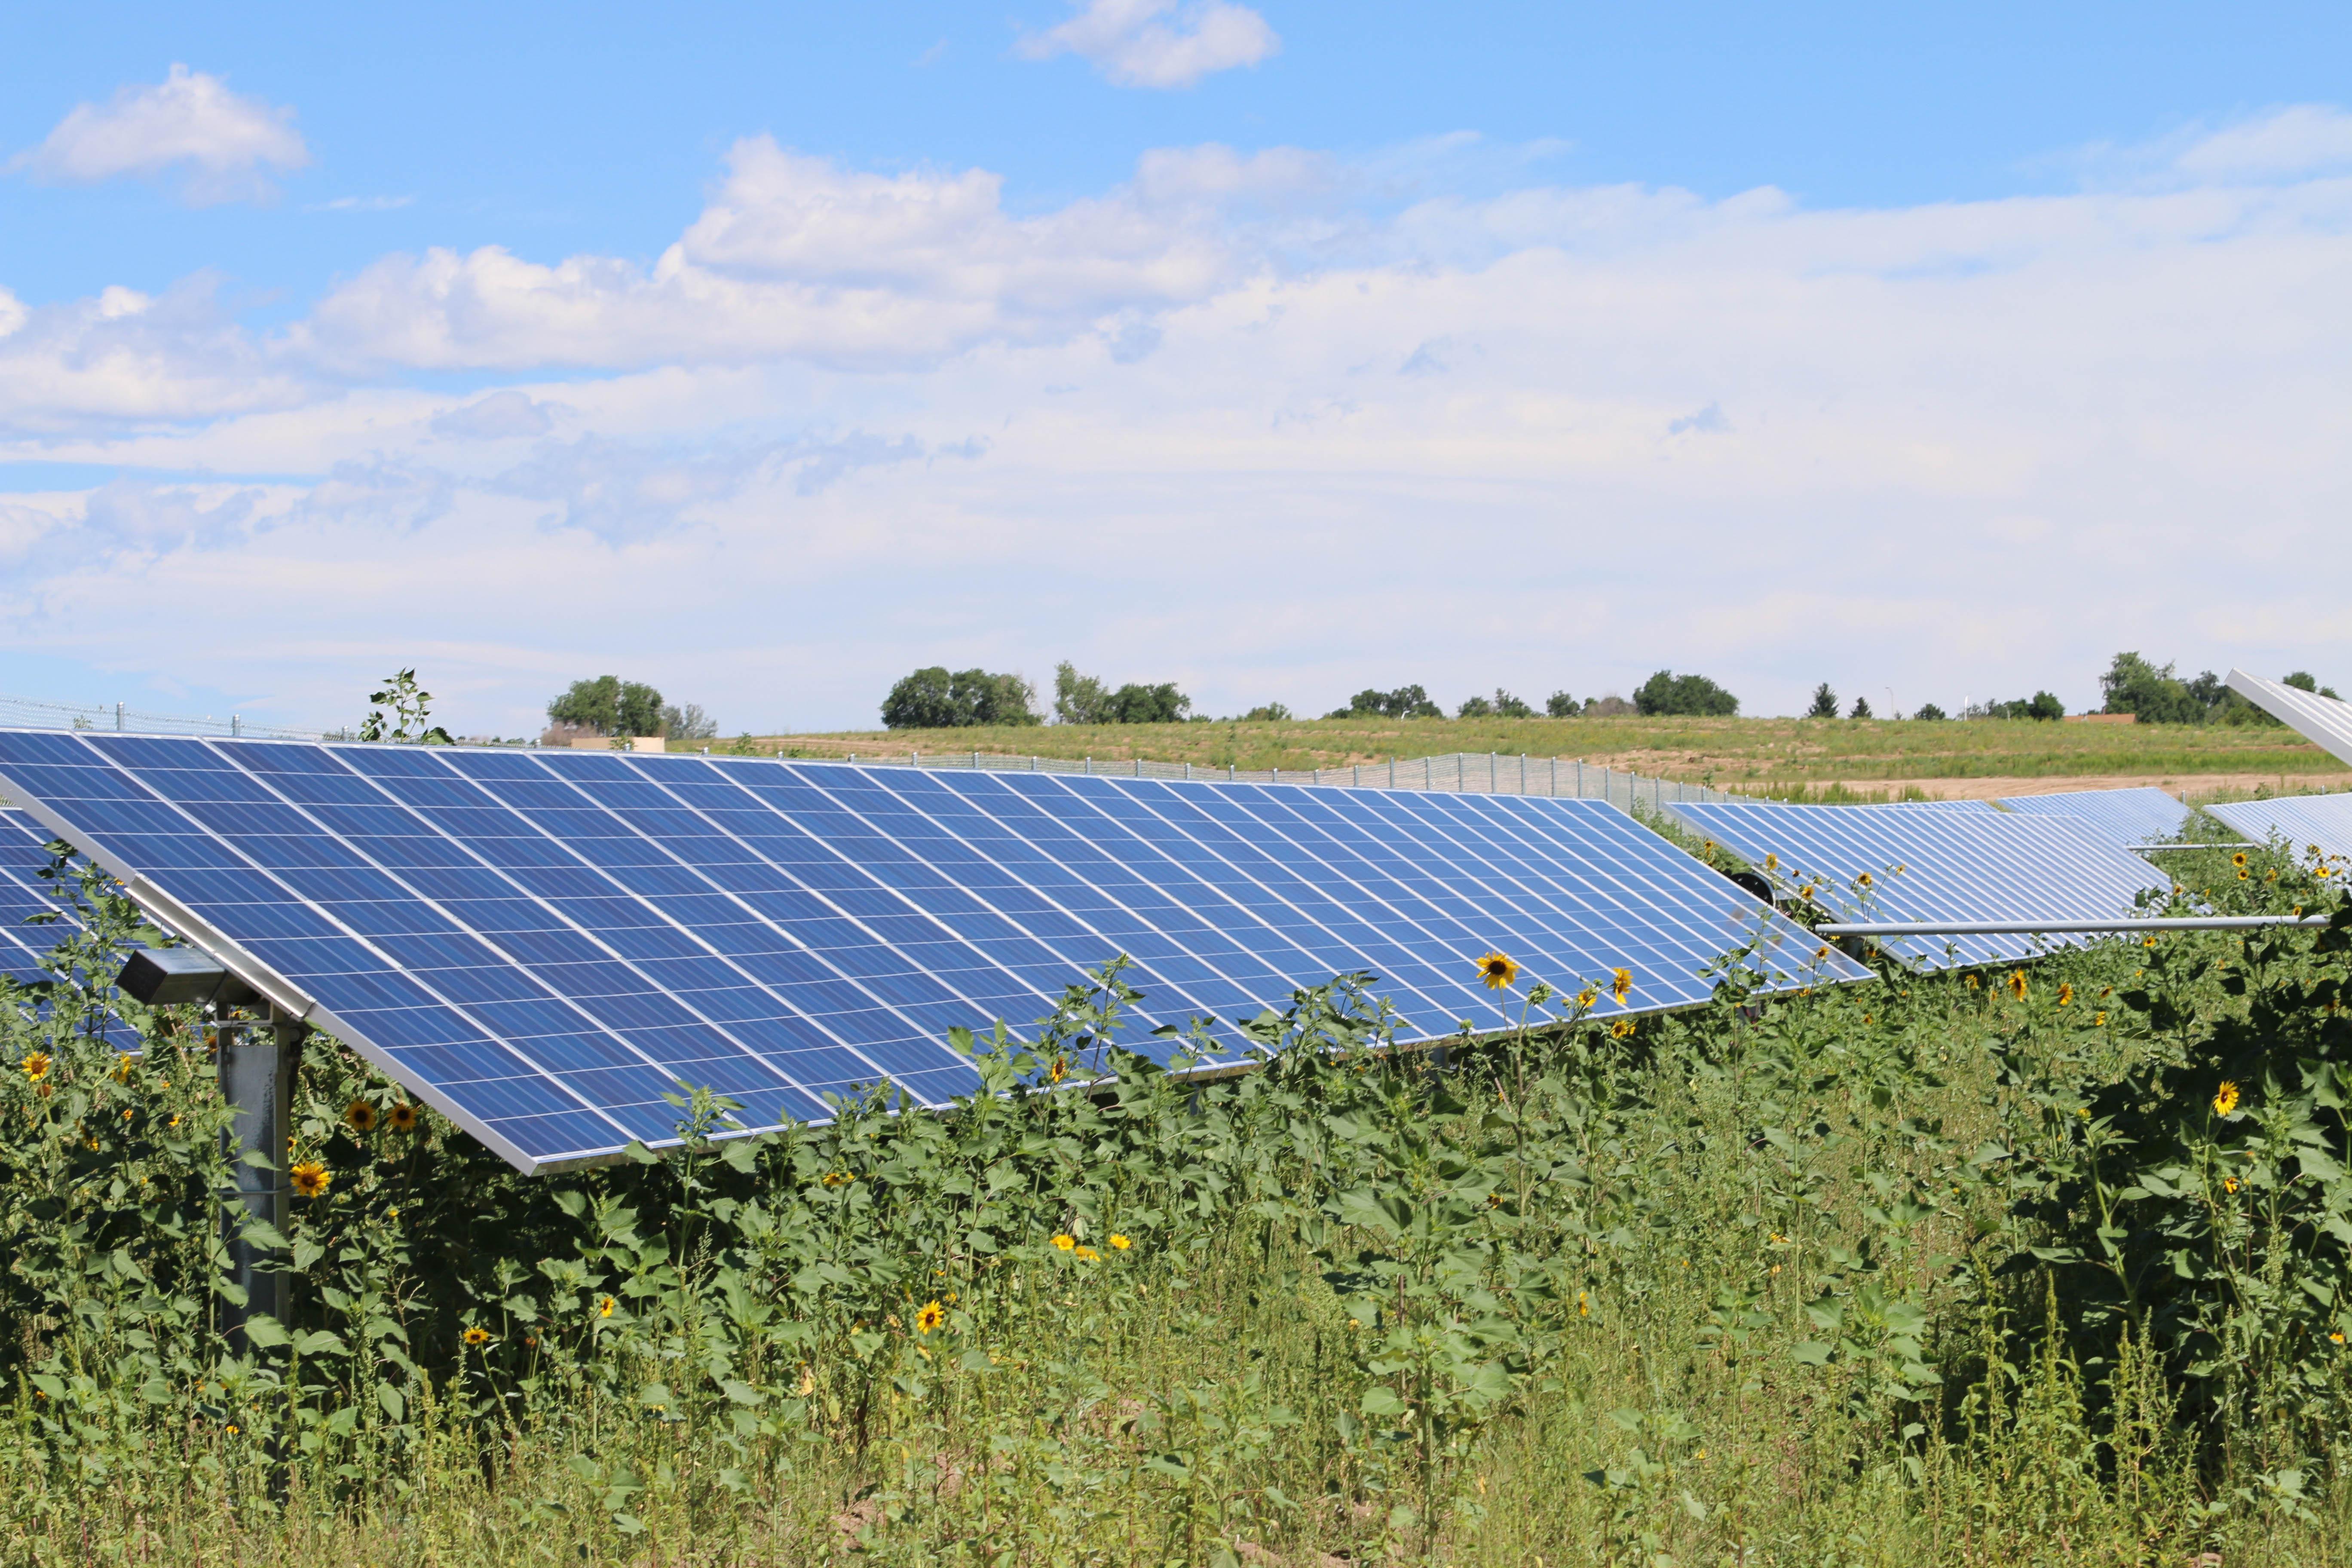 SunShare Launches 10 MWs of Community Solar Gardens in Colorado